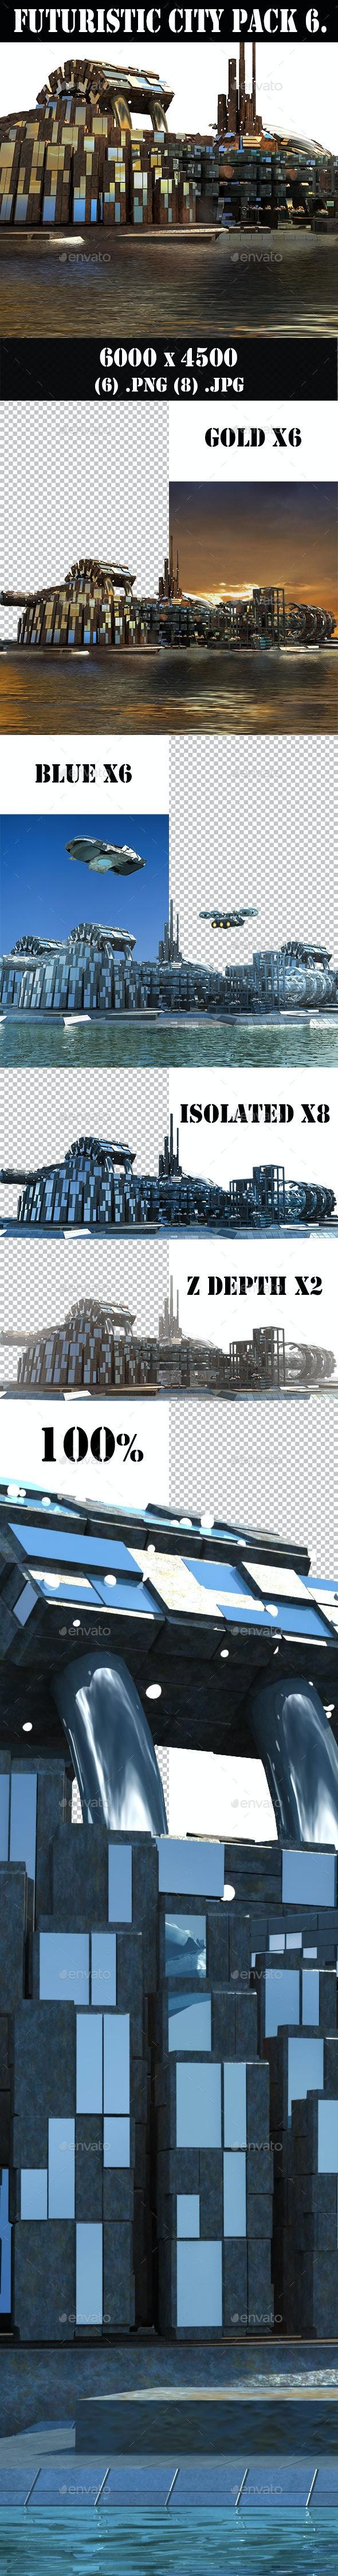 Futuristic City Pack 6. Marina Skyline - Architecture 3D Renders